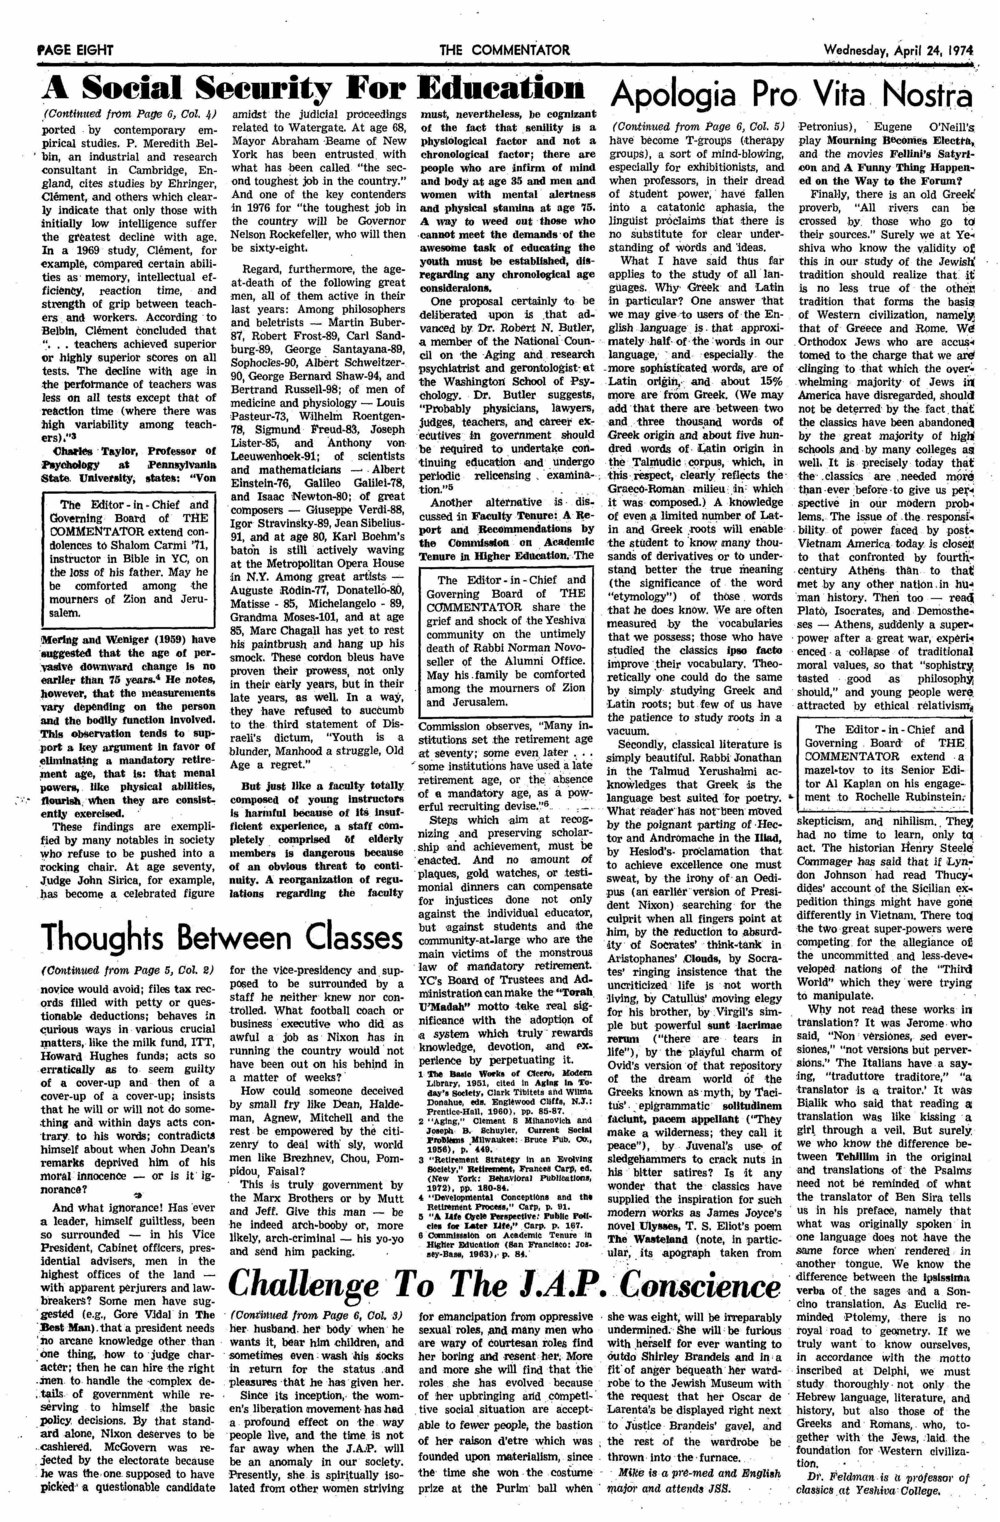 1974.4.24.TC--Apologia Pro Vita Nostra_Page_2.jpg